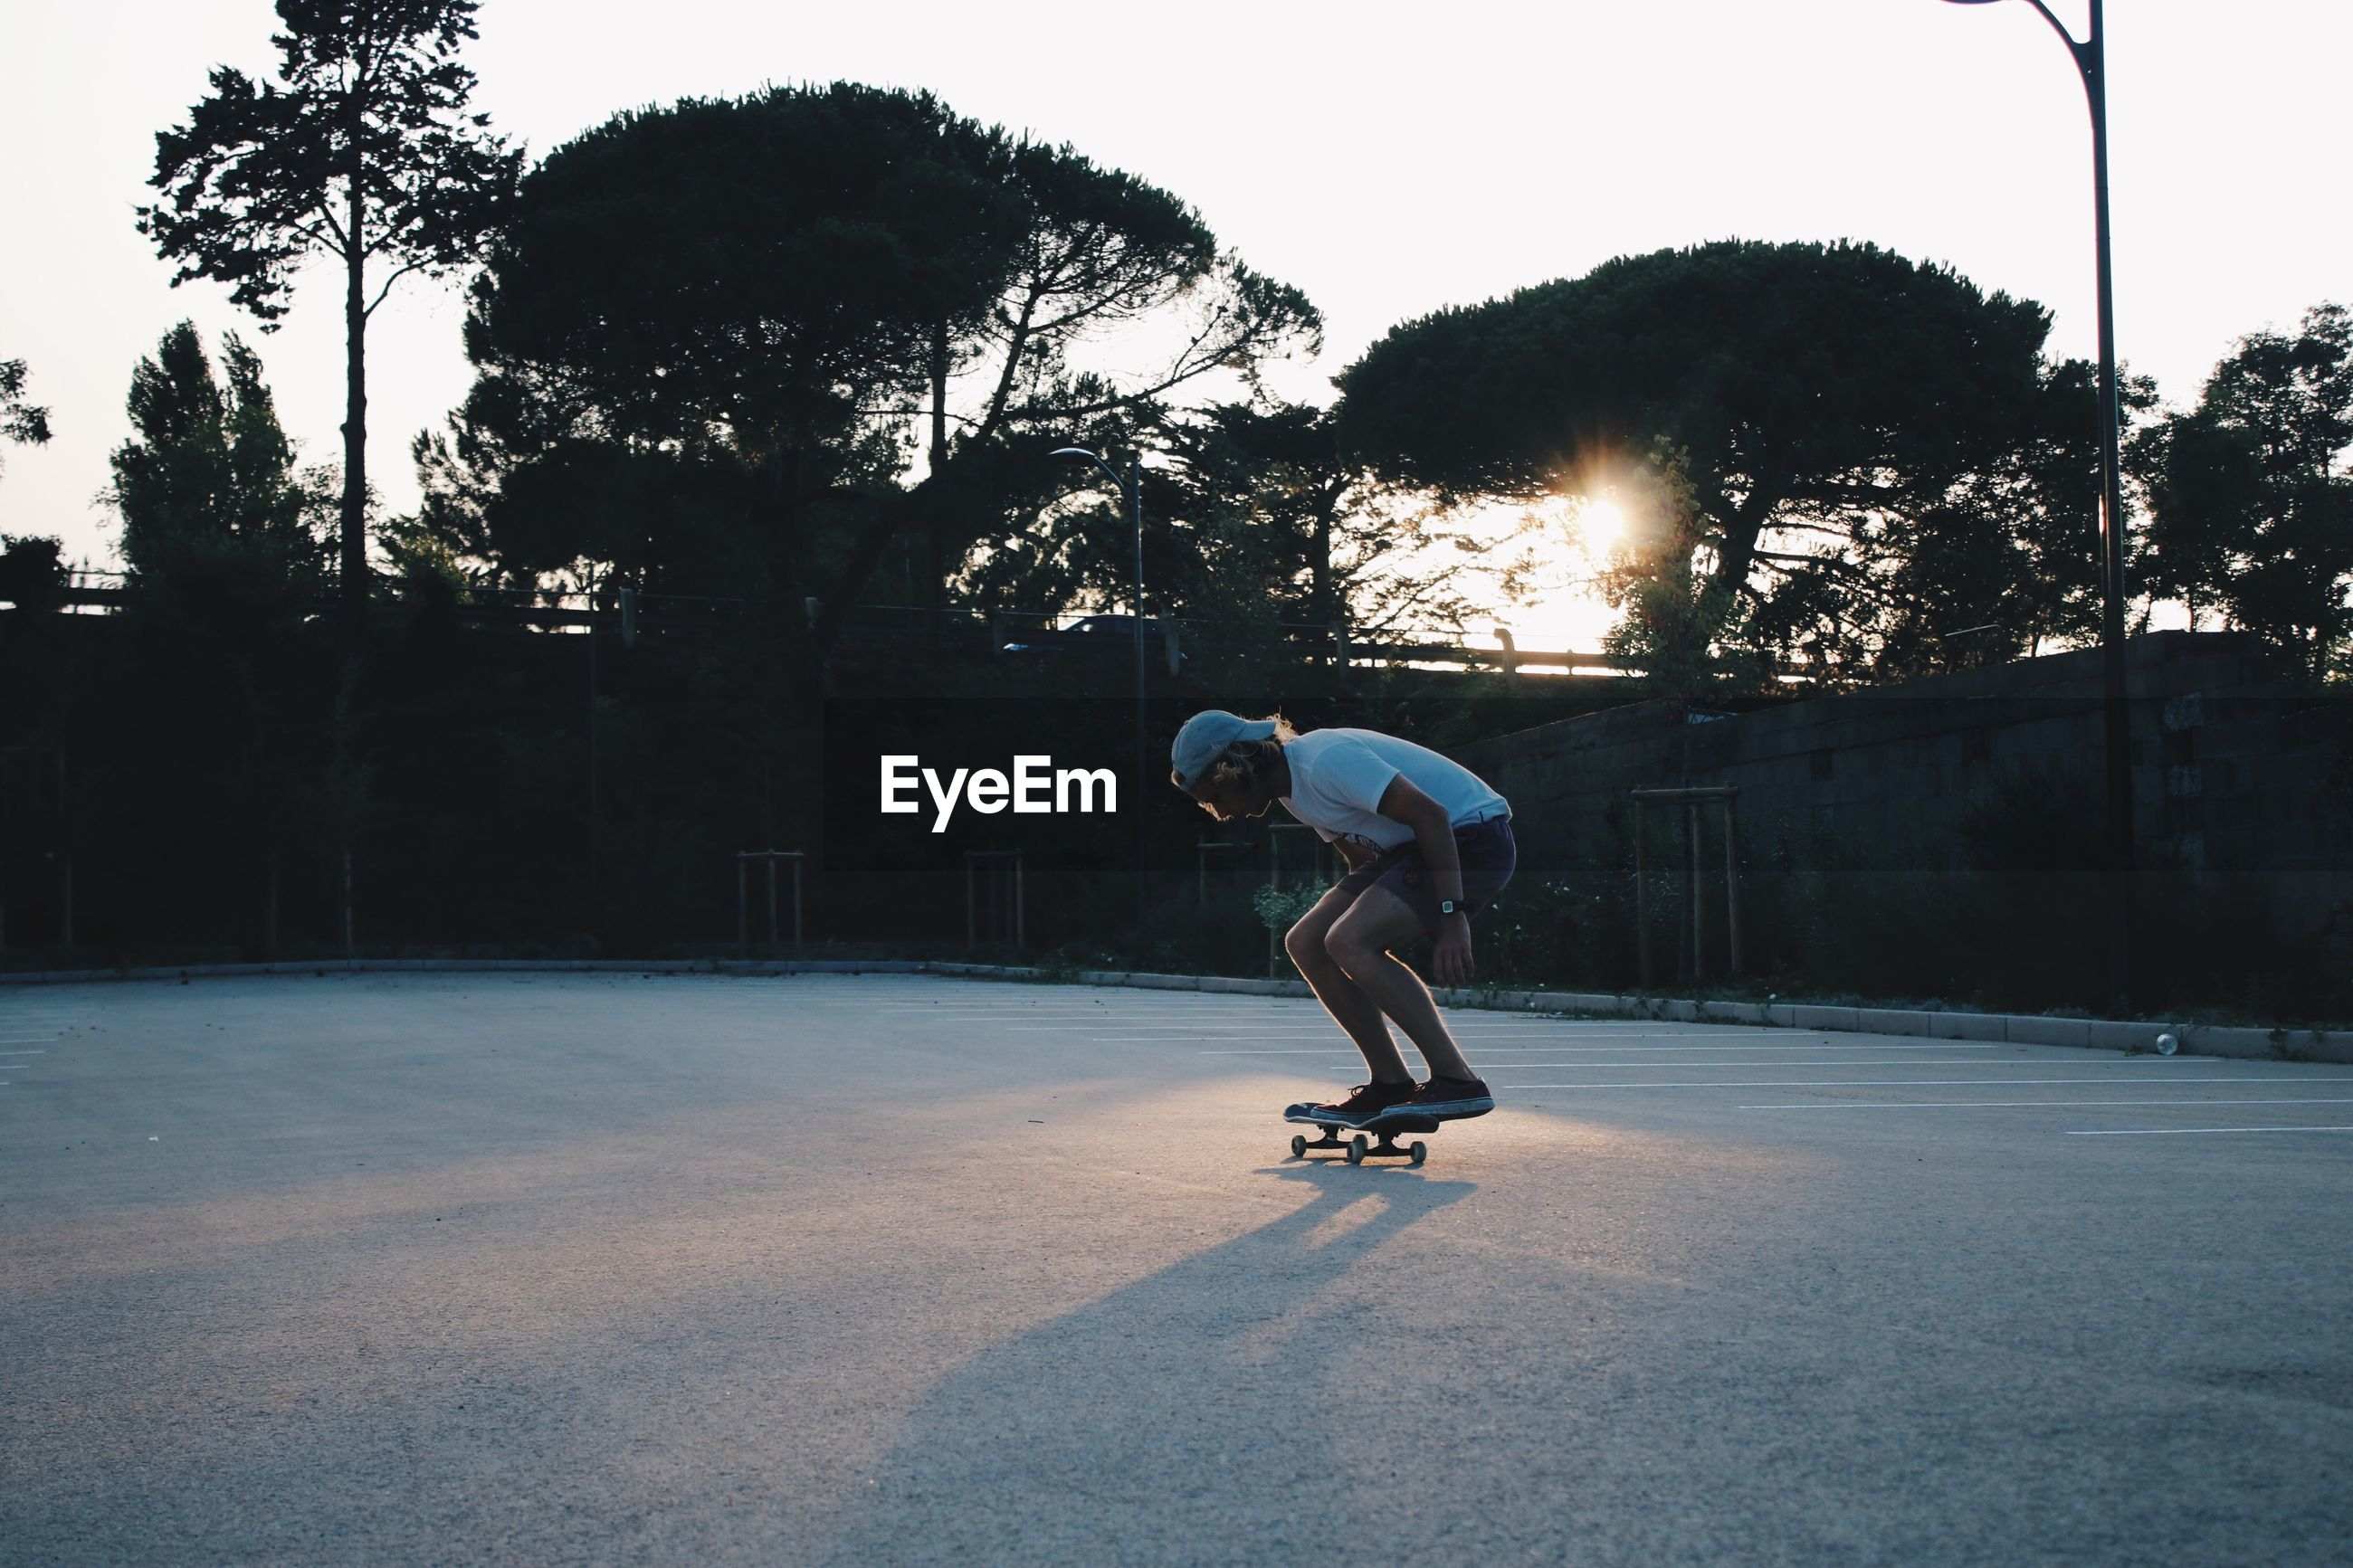 Full length of man skateboarding at playground during sunset